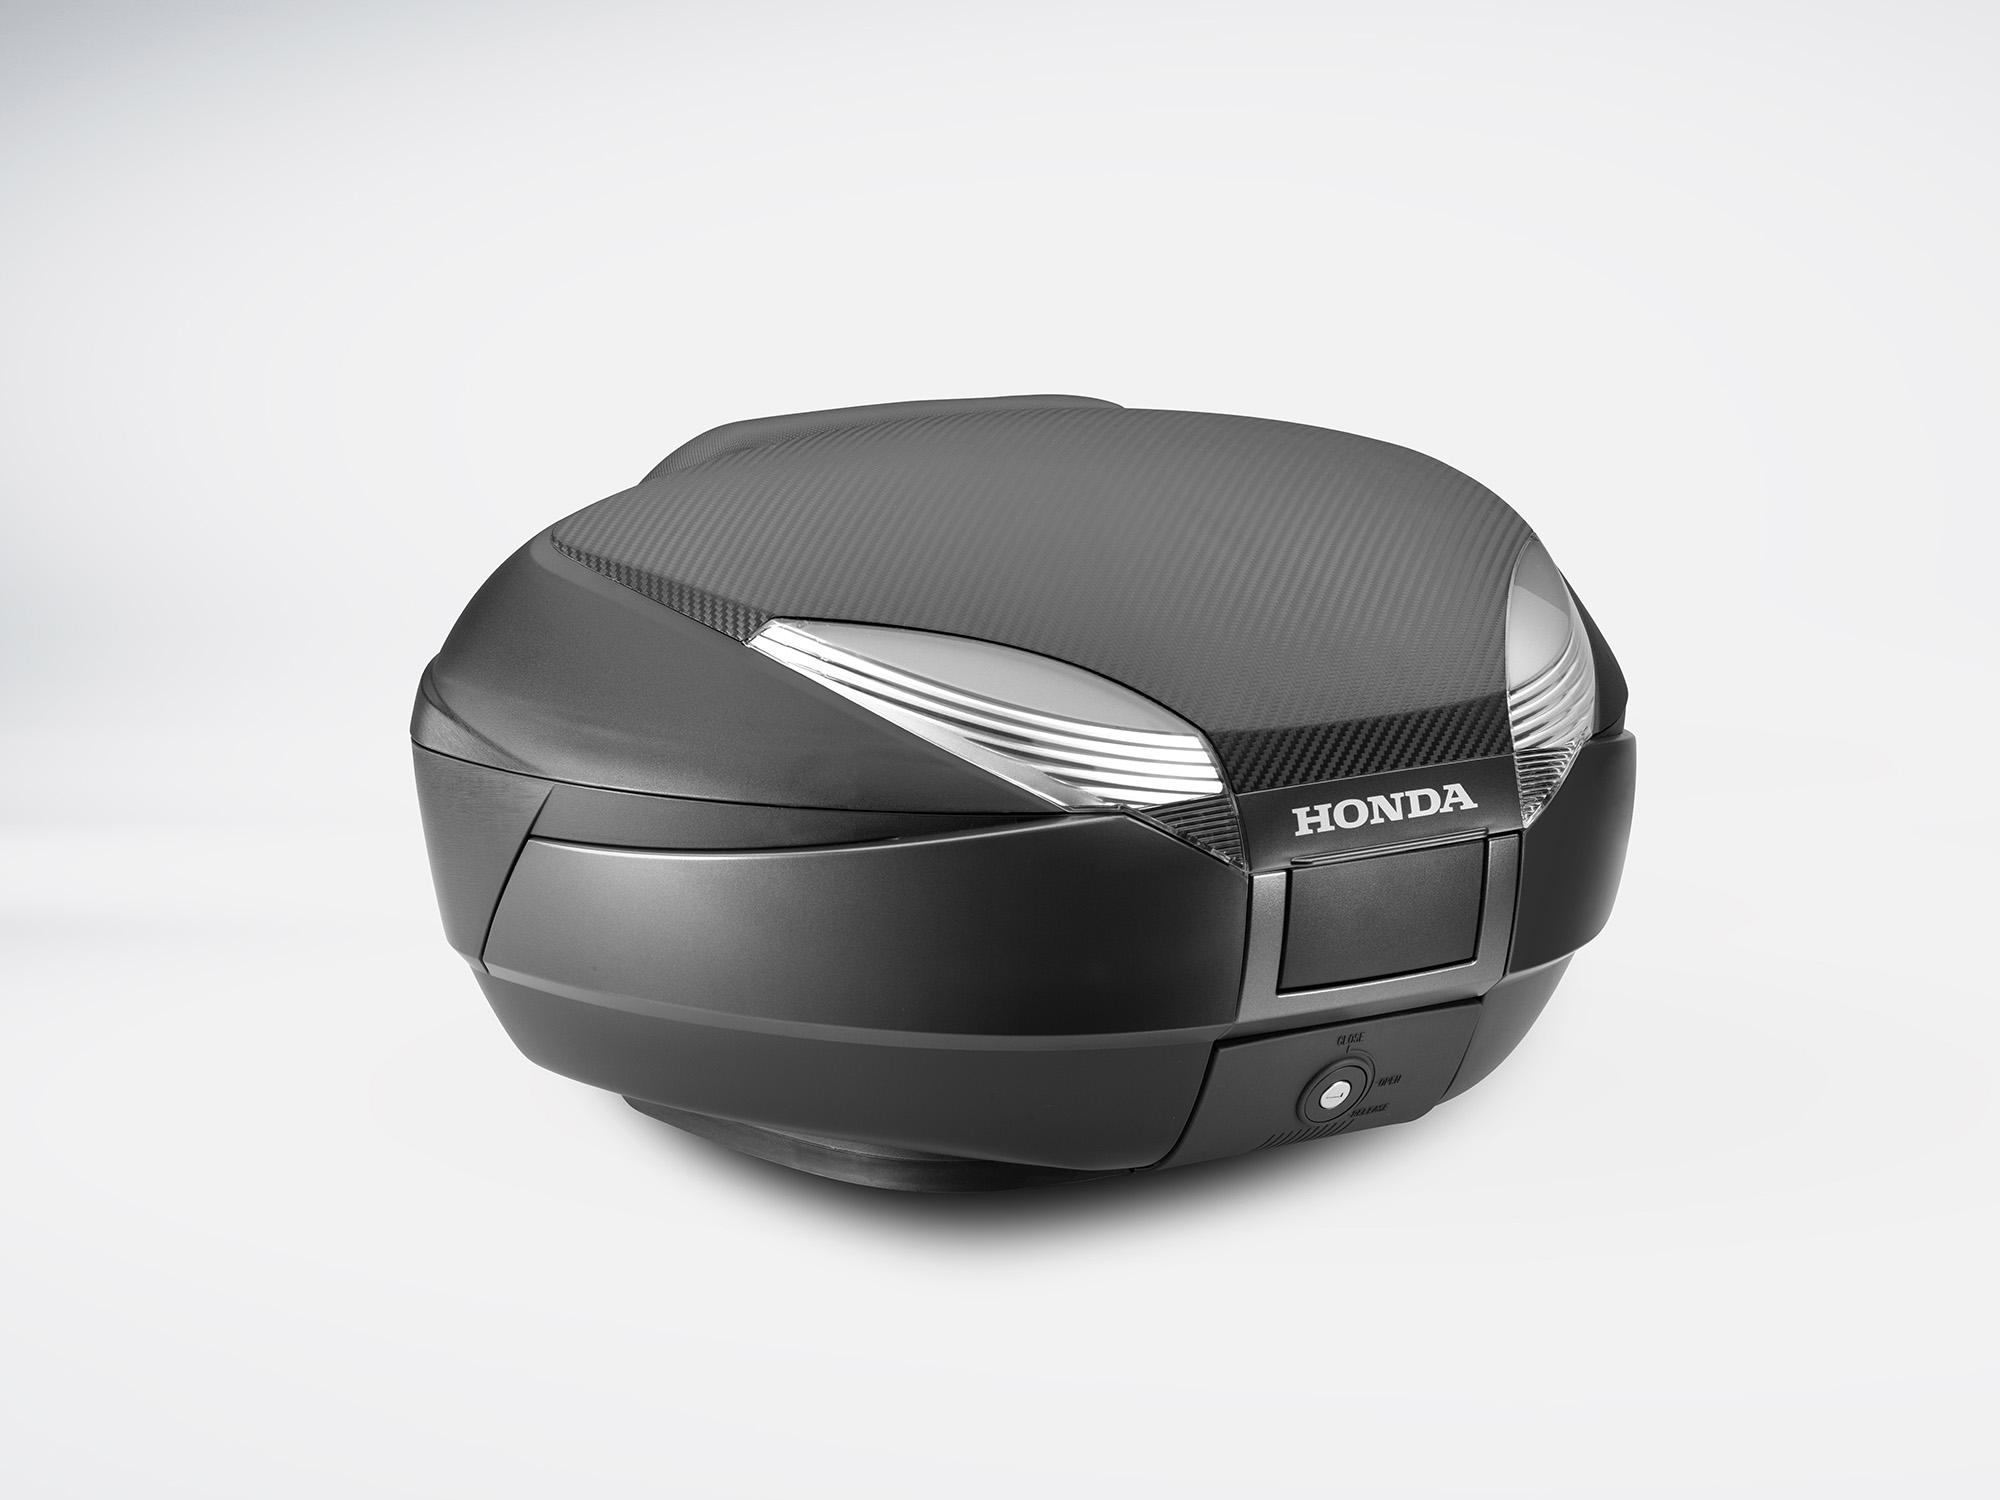 Honda Honda topbox 48 ltr inclusief rugsteun